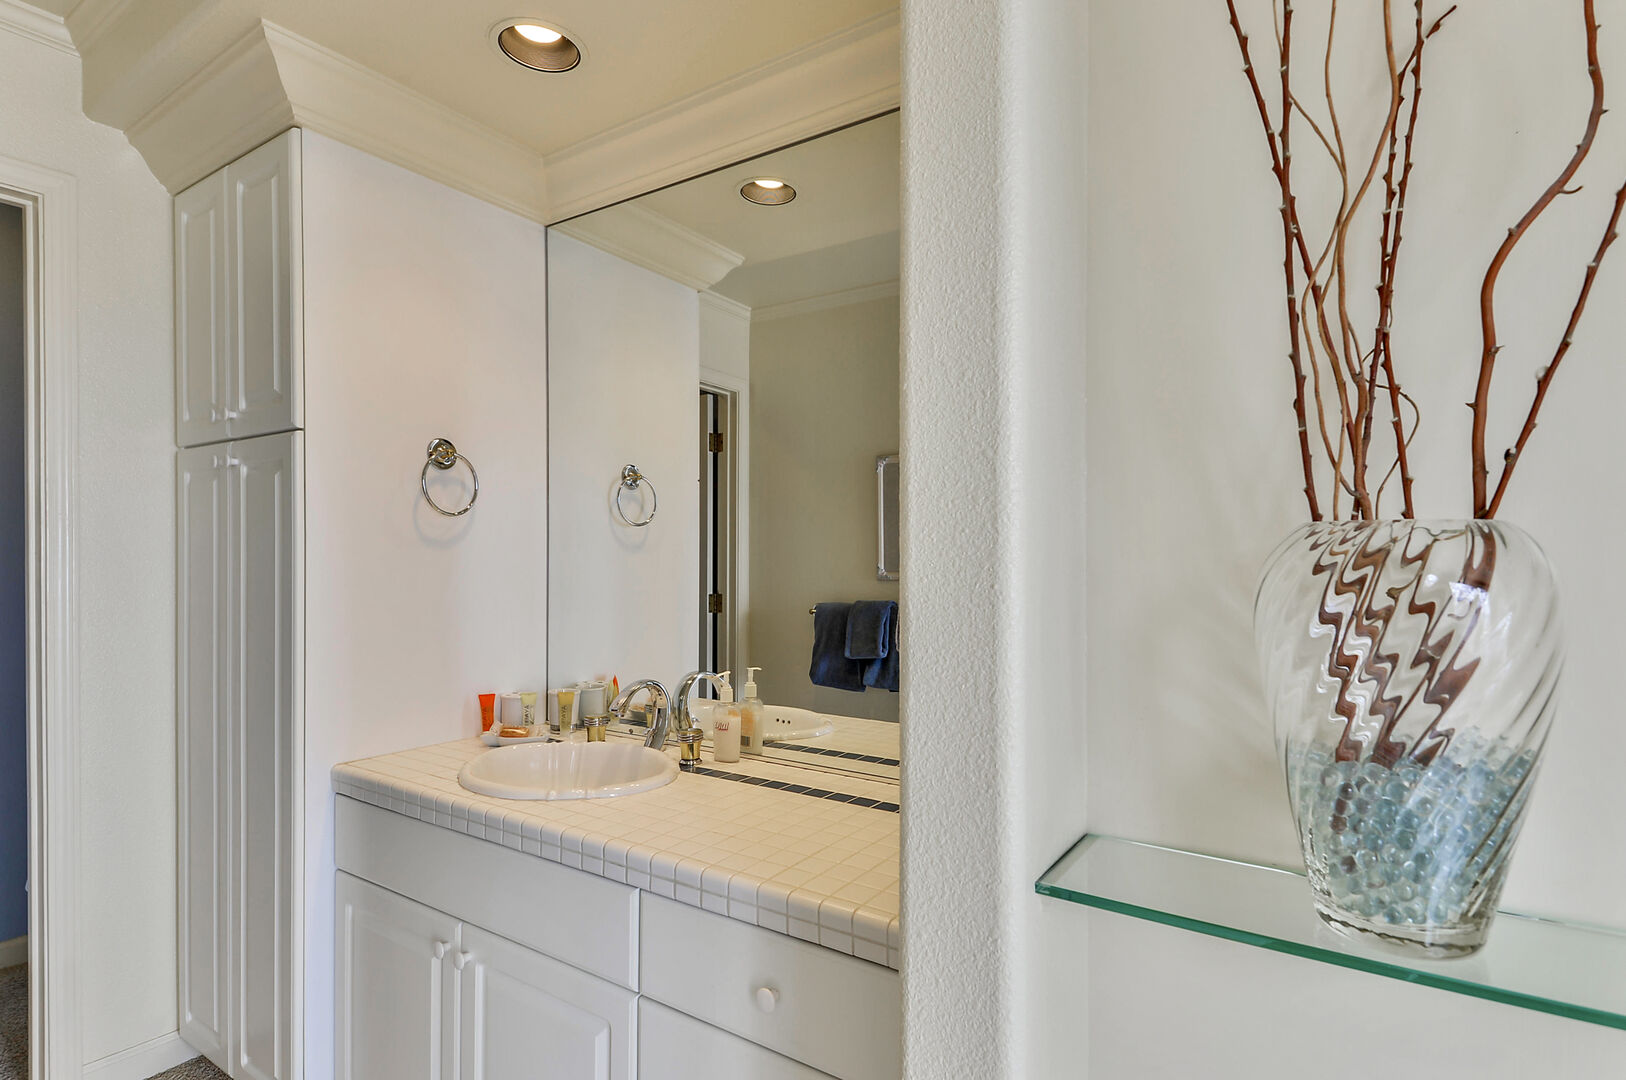 Bathroom Storage Cabinet, Sink, Mirror, Glass Shelf, and a Vase.